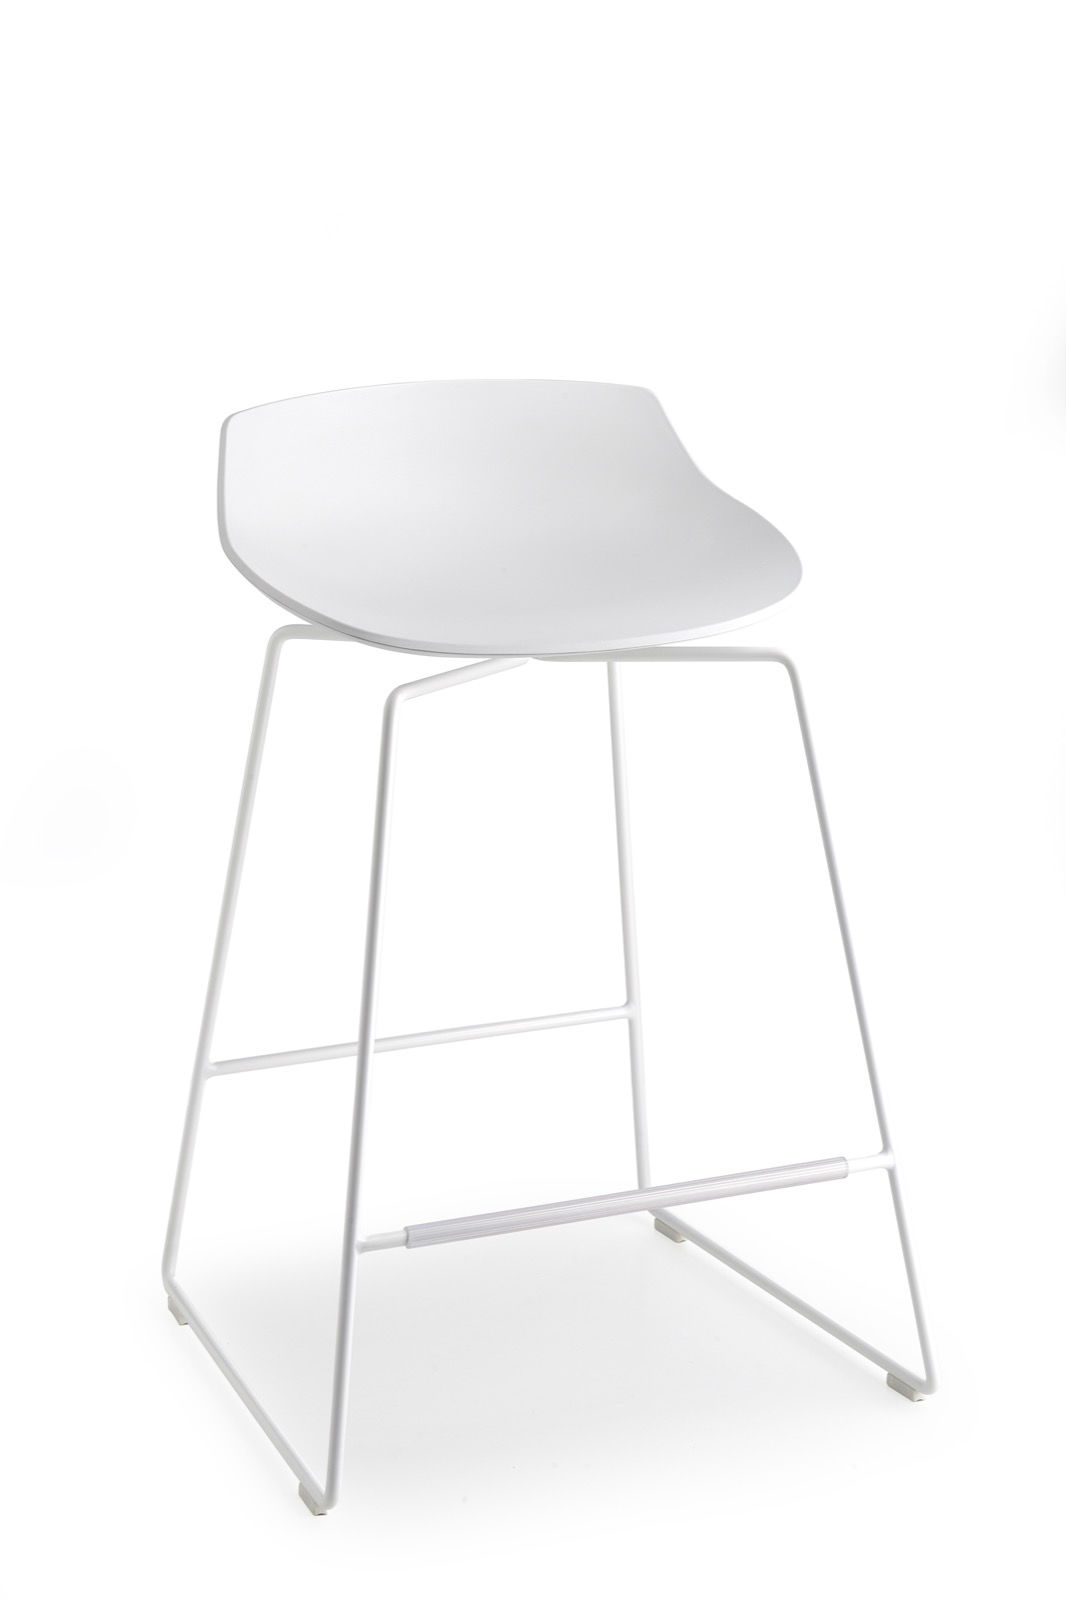 mdf italia flow slim barkruk matser wageningen. Black Bedroom Furniture Sets. Home Design Ideas